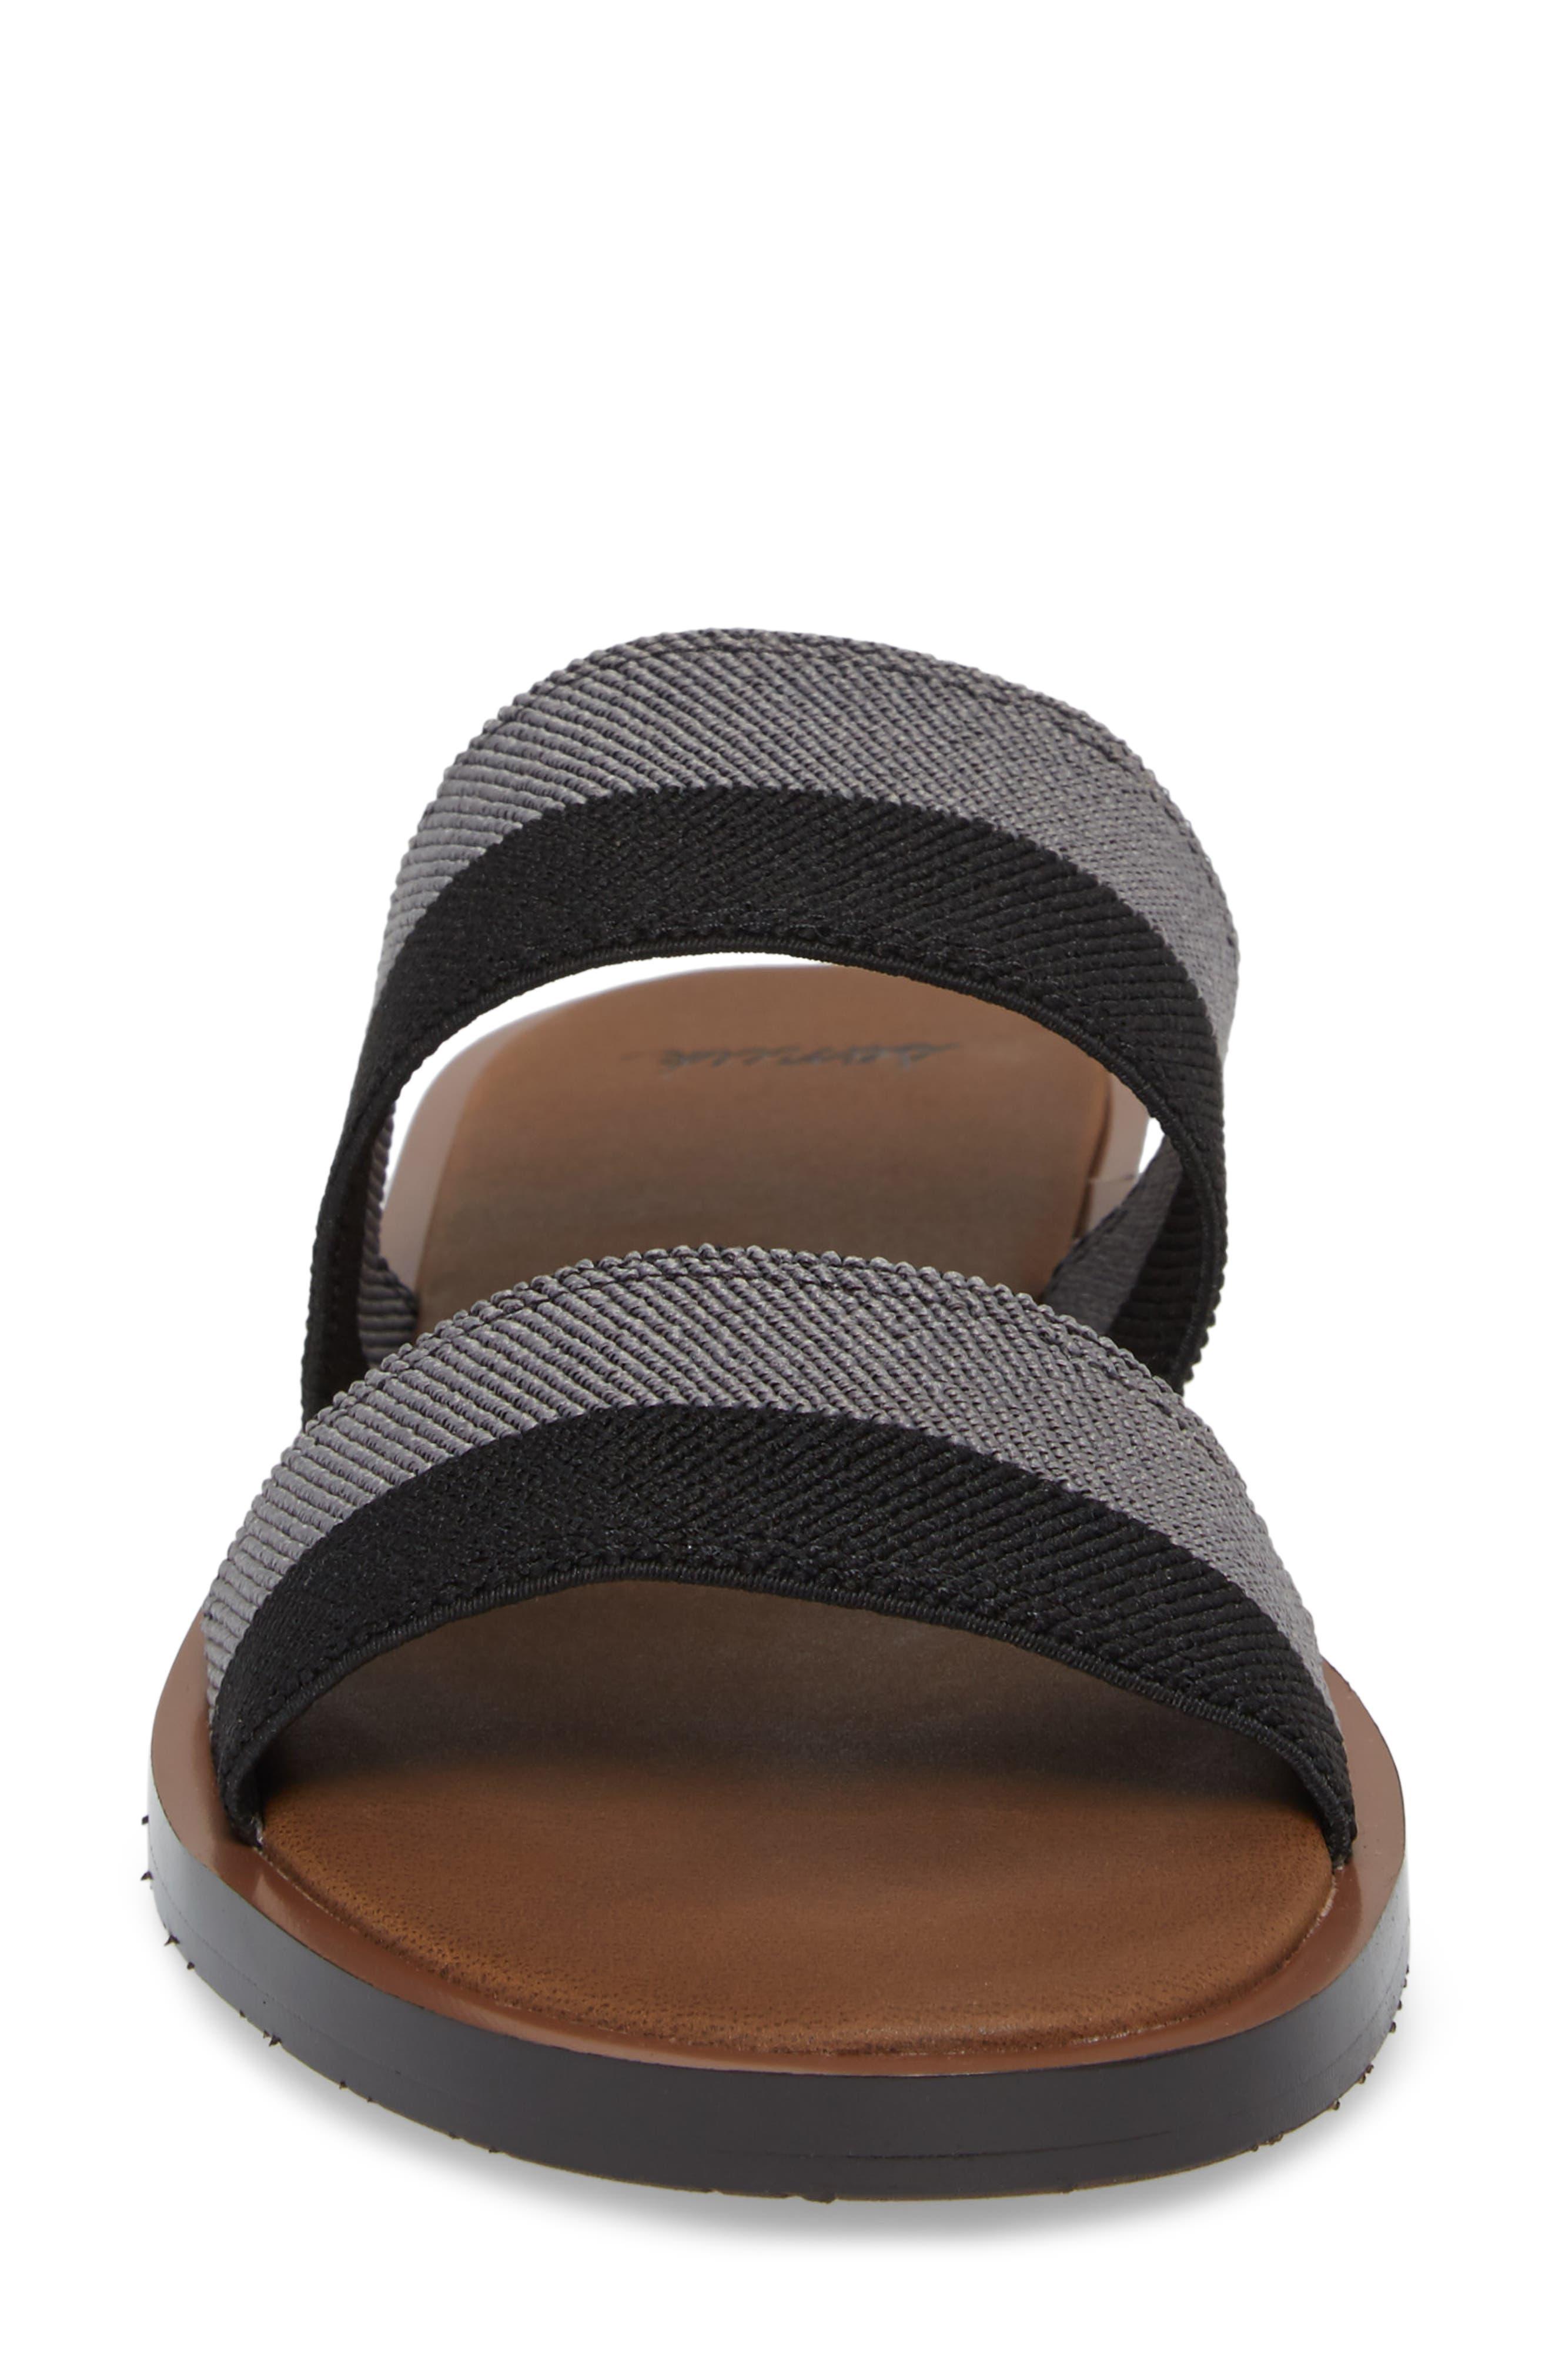 Yoga Gora Gora Slide Sandal,                             Alternate thumbnail 4, color,                             BLACK/ CHARCOAL